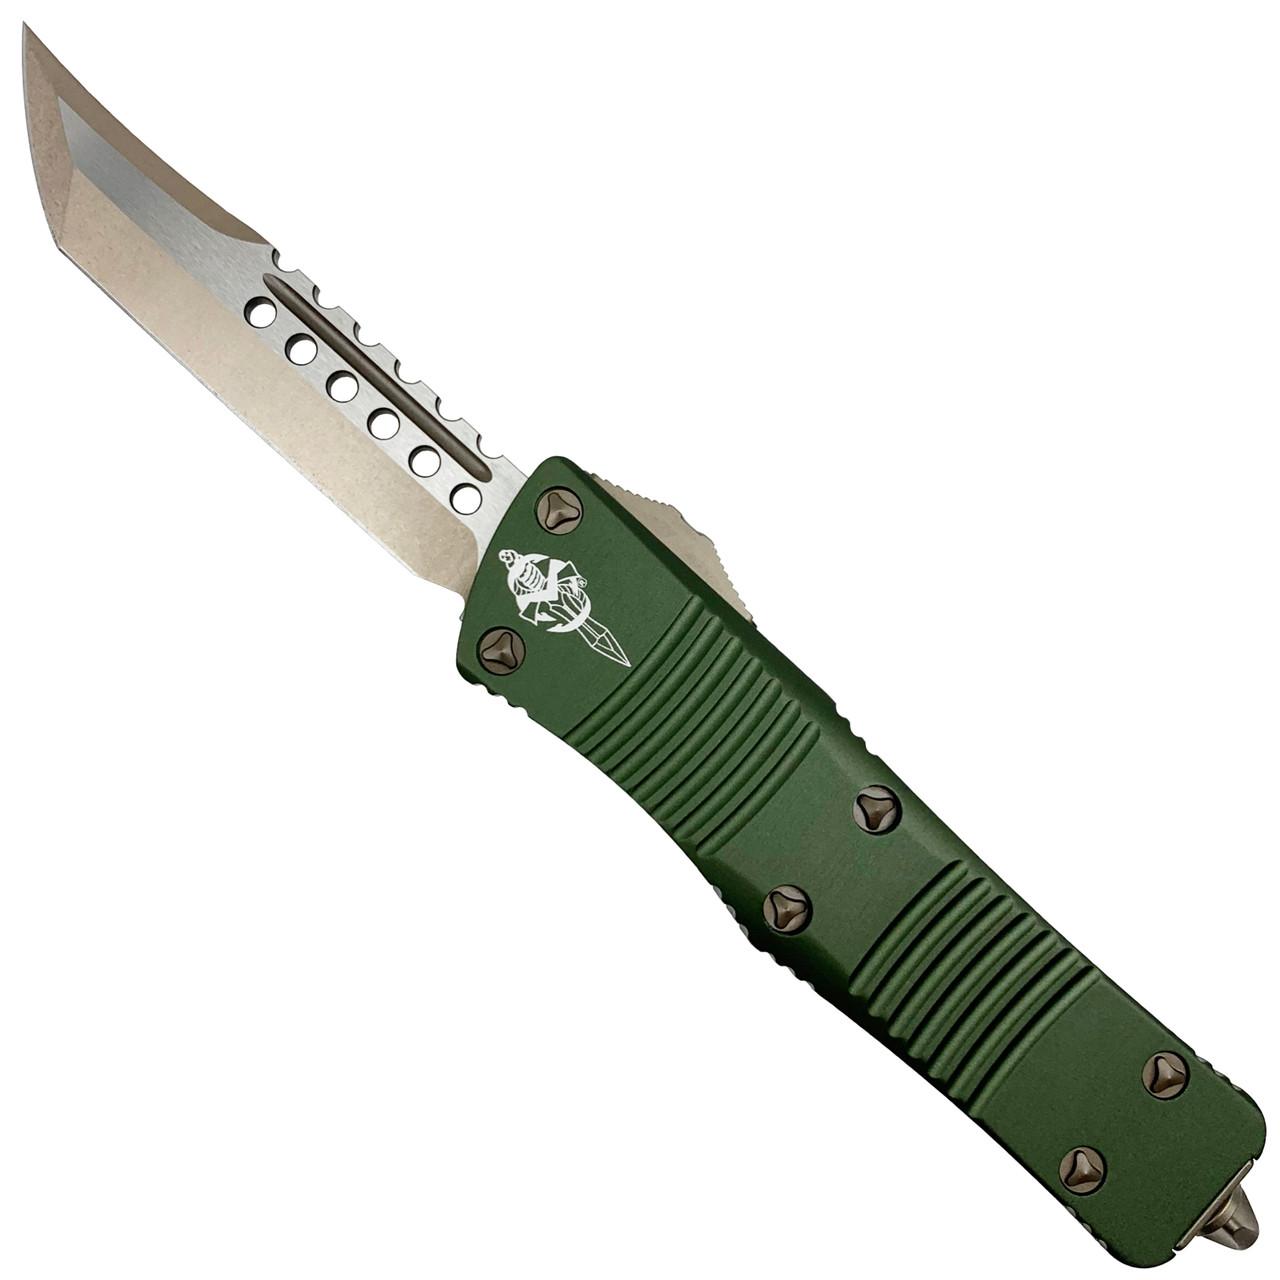 Microtech OD Green Troodon Hellhound OTF Auto Knife, Bronze Blade